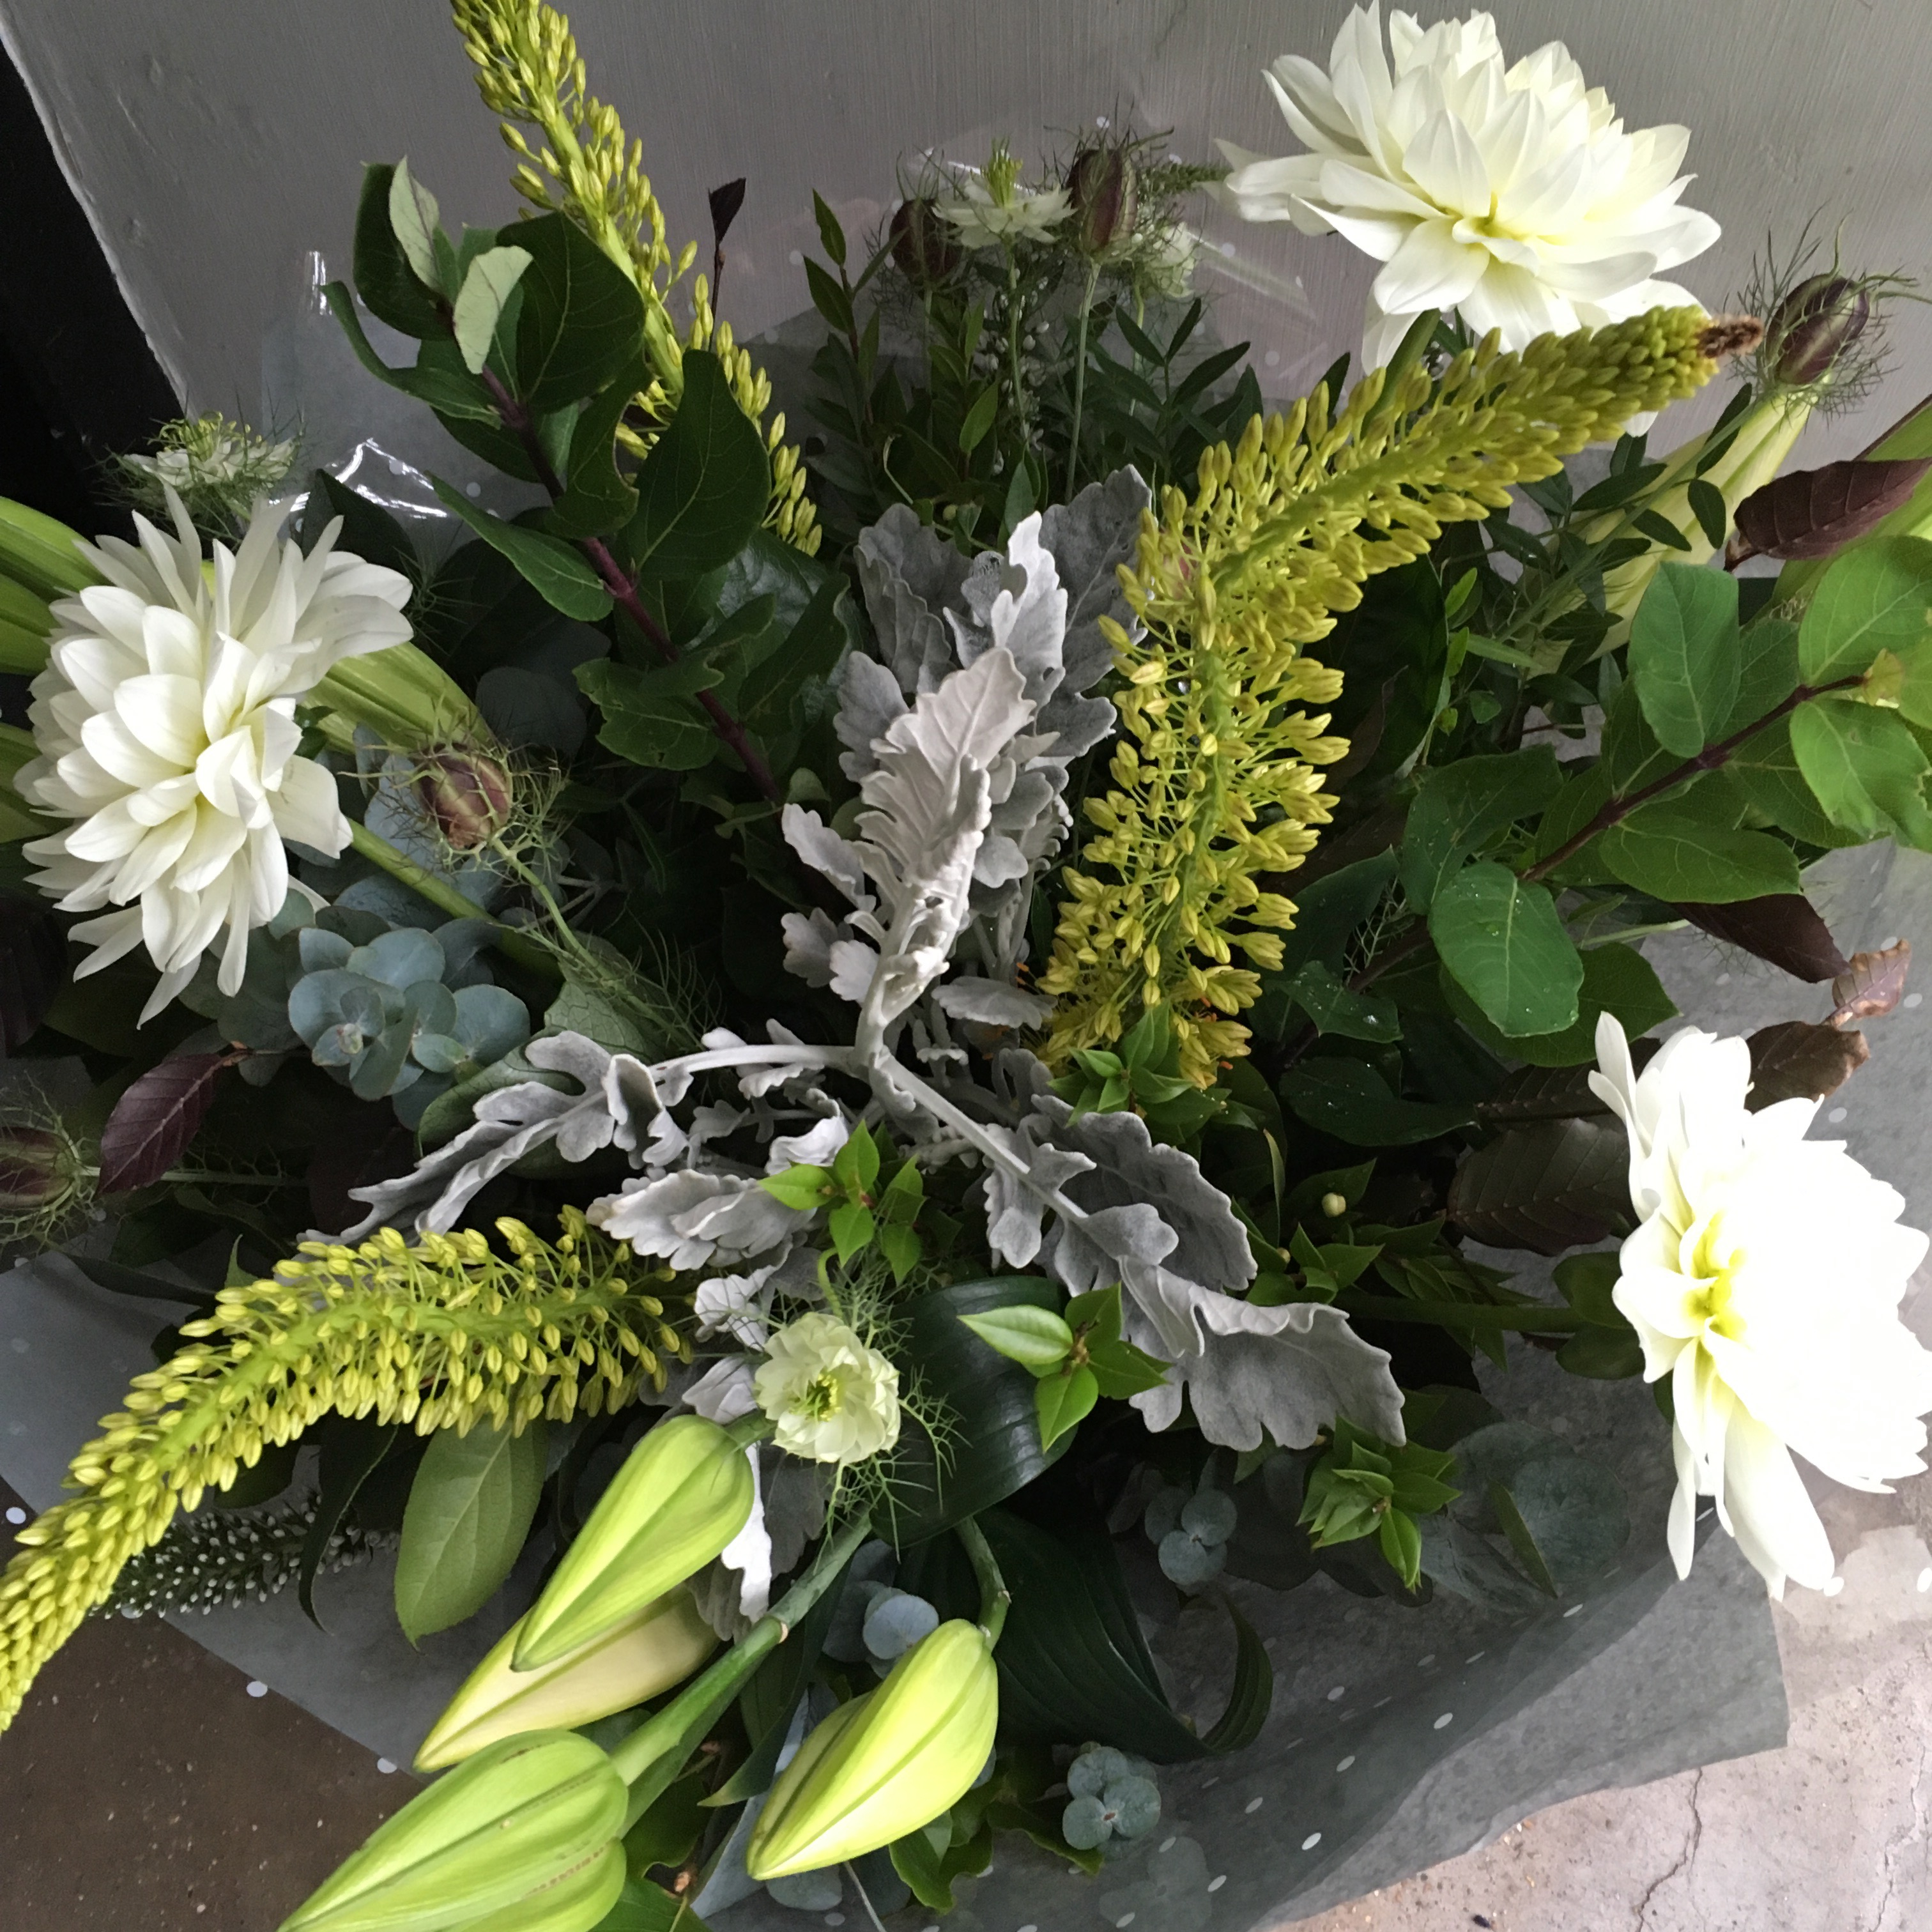 Foliage maketh the bouquet.